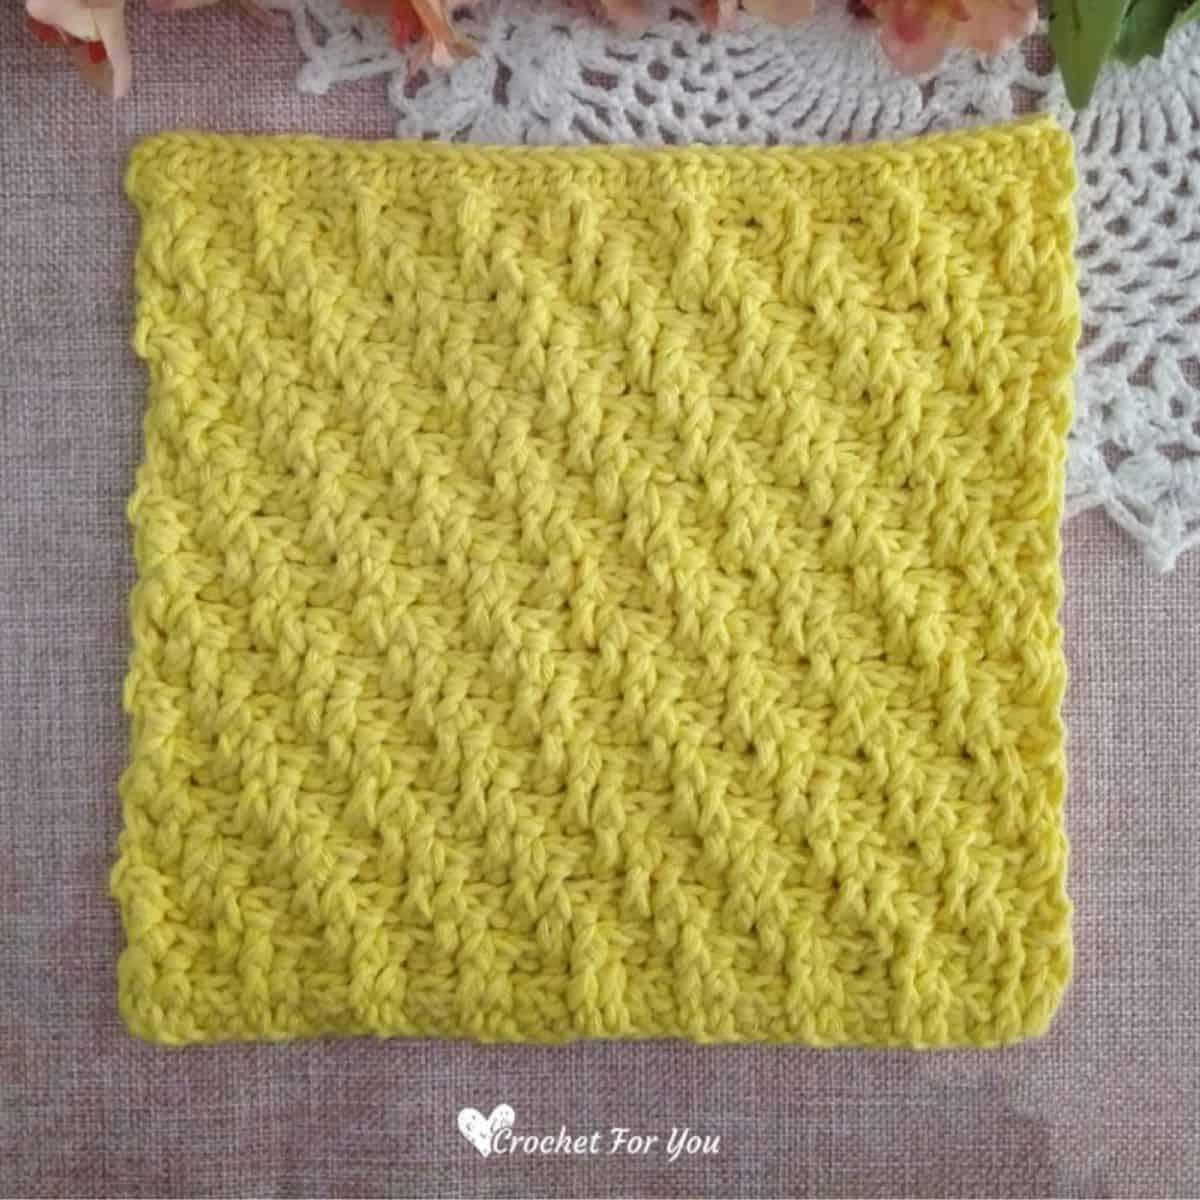 yellow crochet square dishcloth with raised stitches